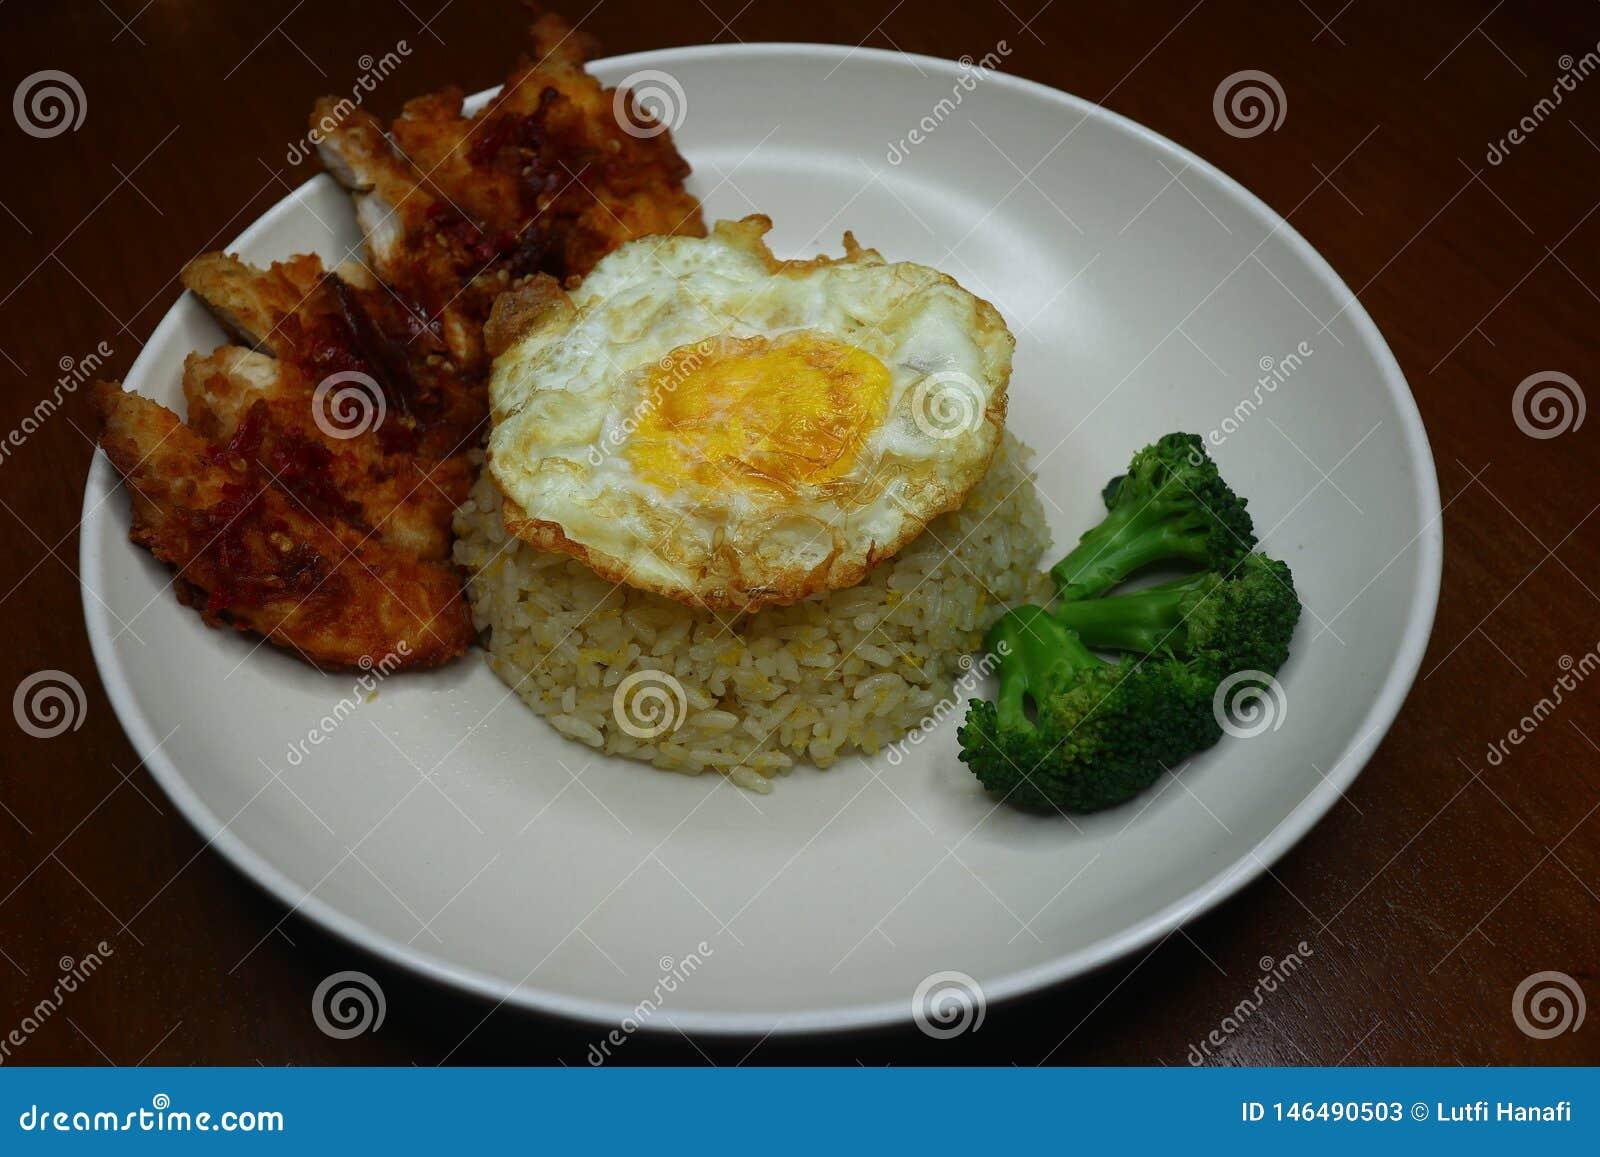 De speciale gebraden rijst met kruidige Spaanse peper braadde kippensaus, broccoli en braadde omelet